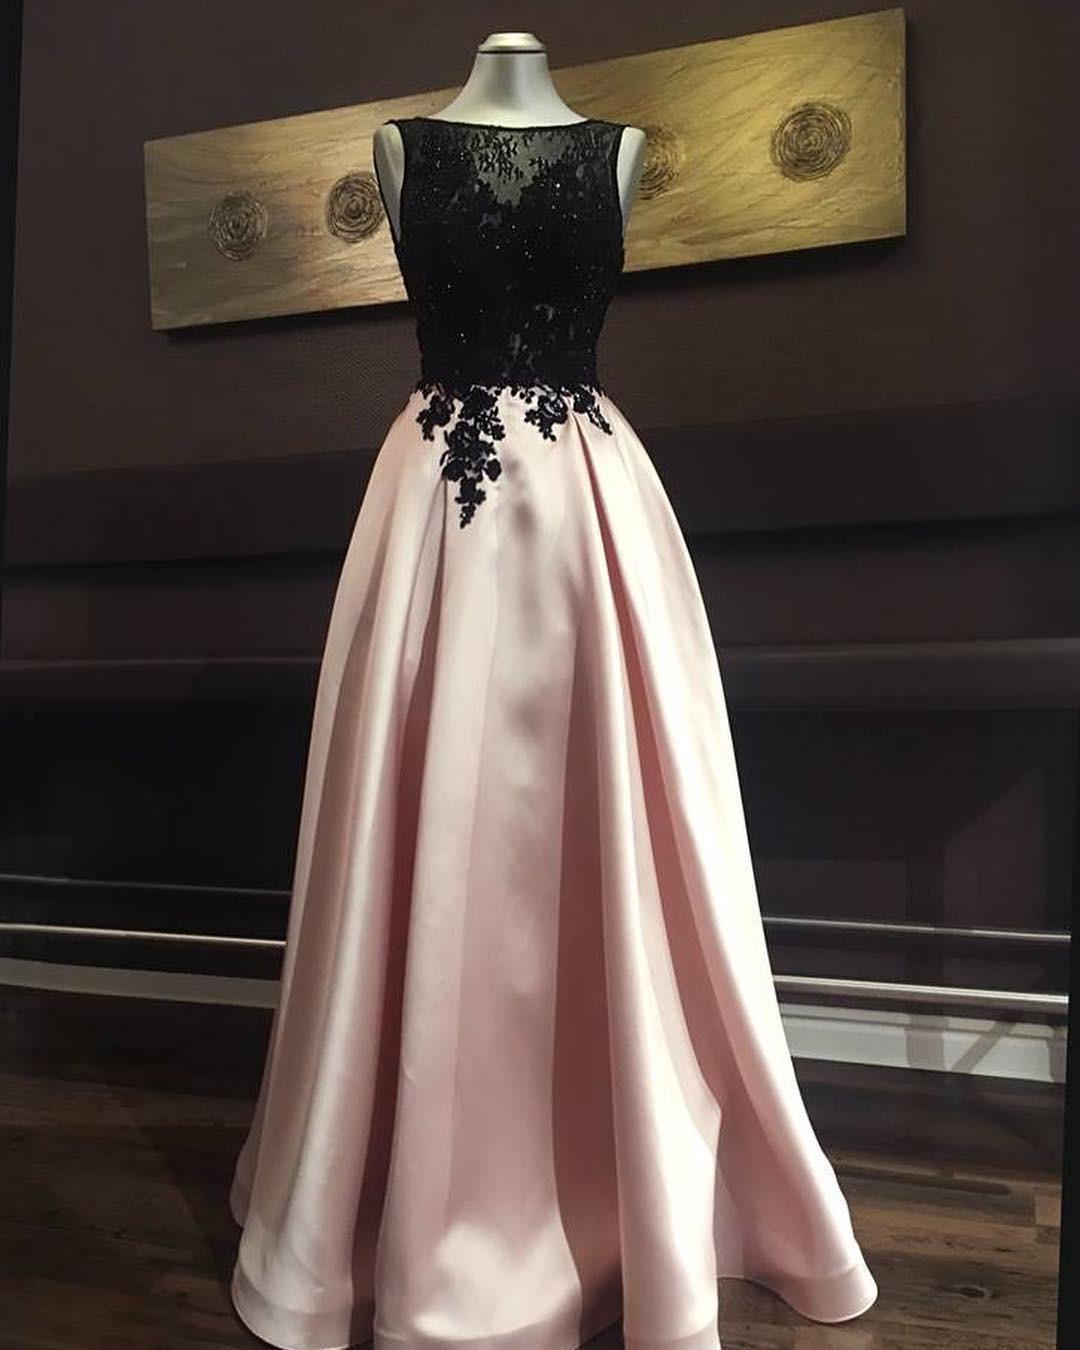 Abend Wunderbar Rosa Abend Kleider Stylish15 Perfekt Rosa Abend Kleider Stylish